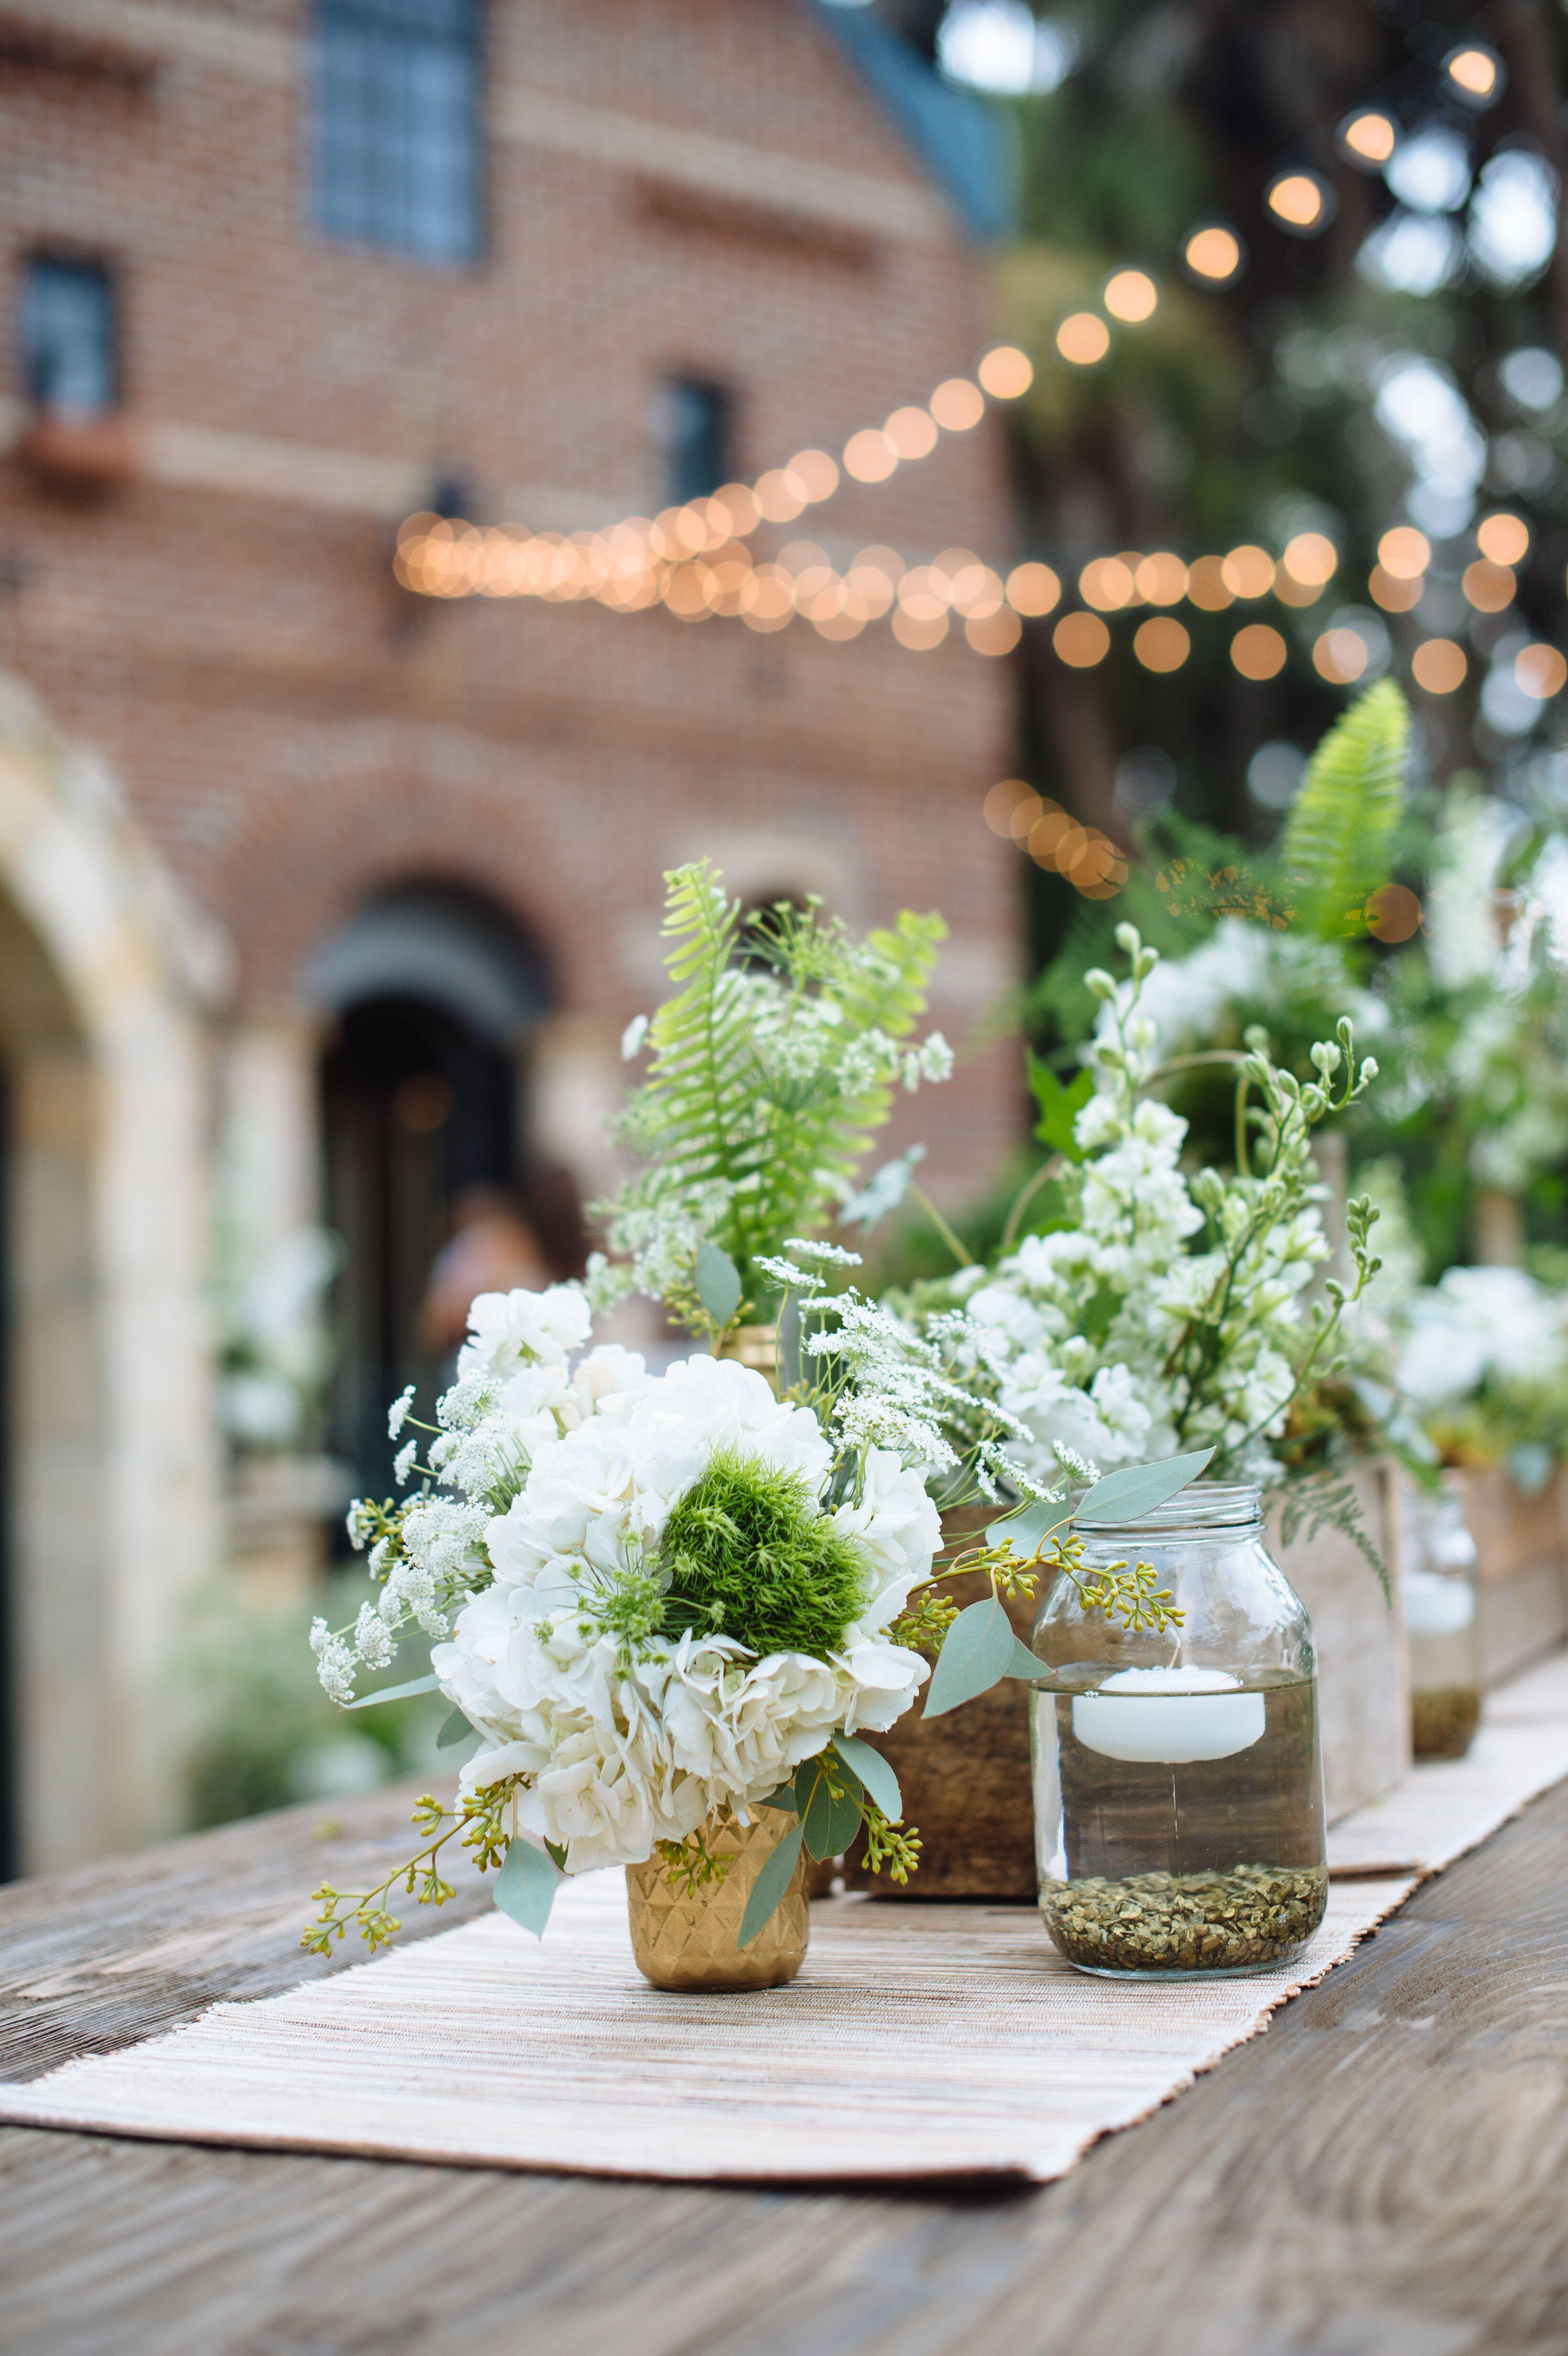 Fern And White Flower Centerpieces